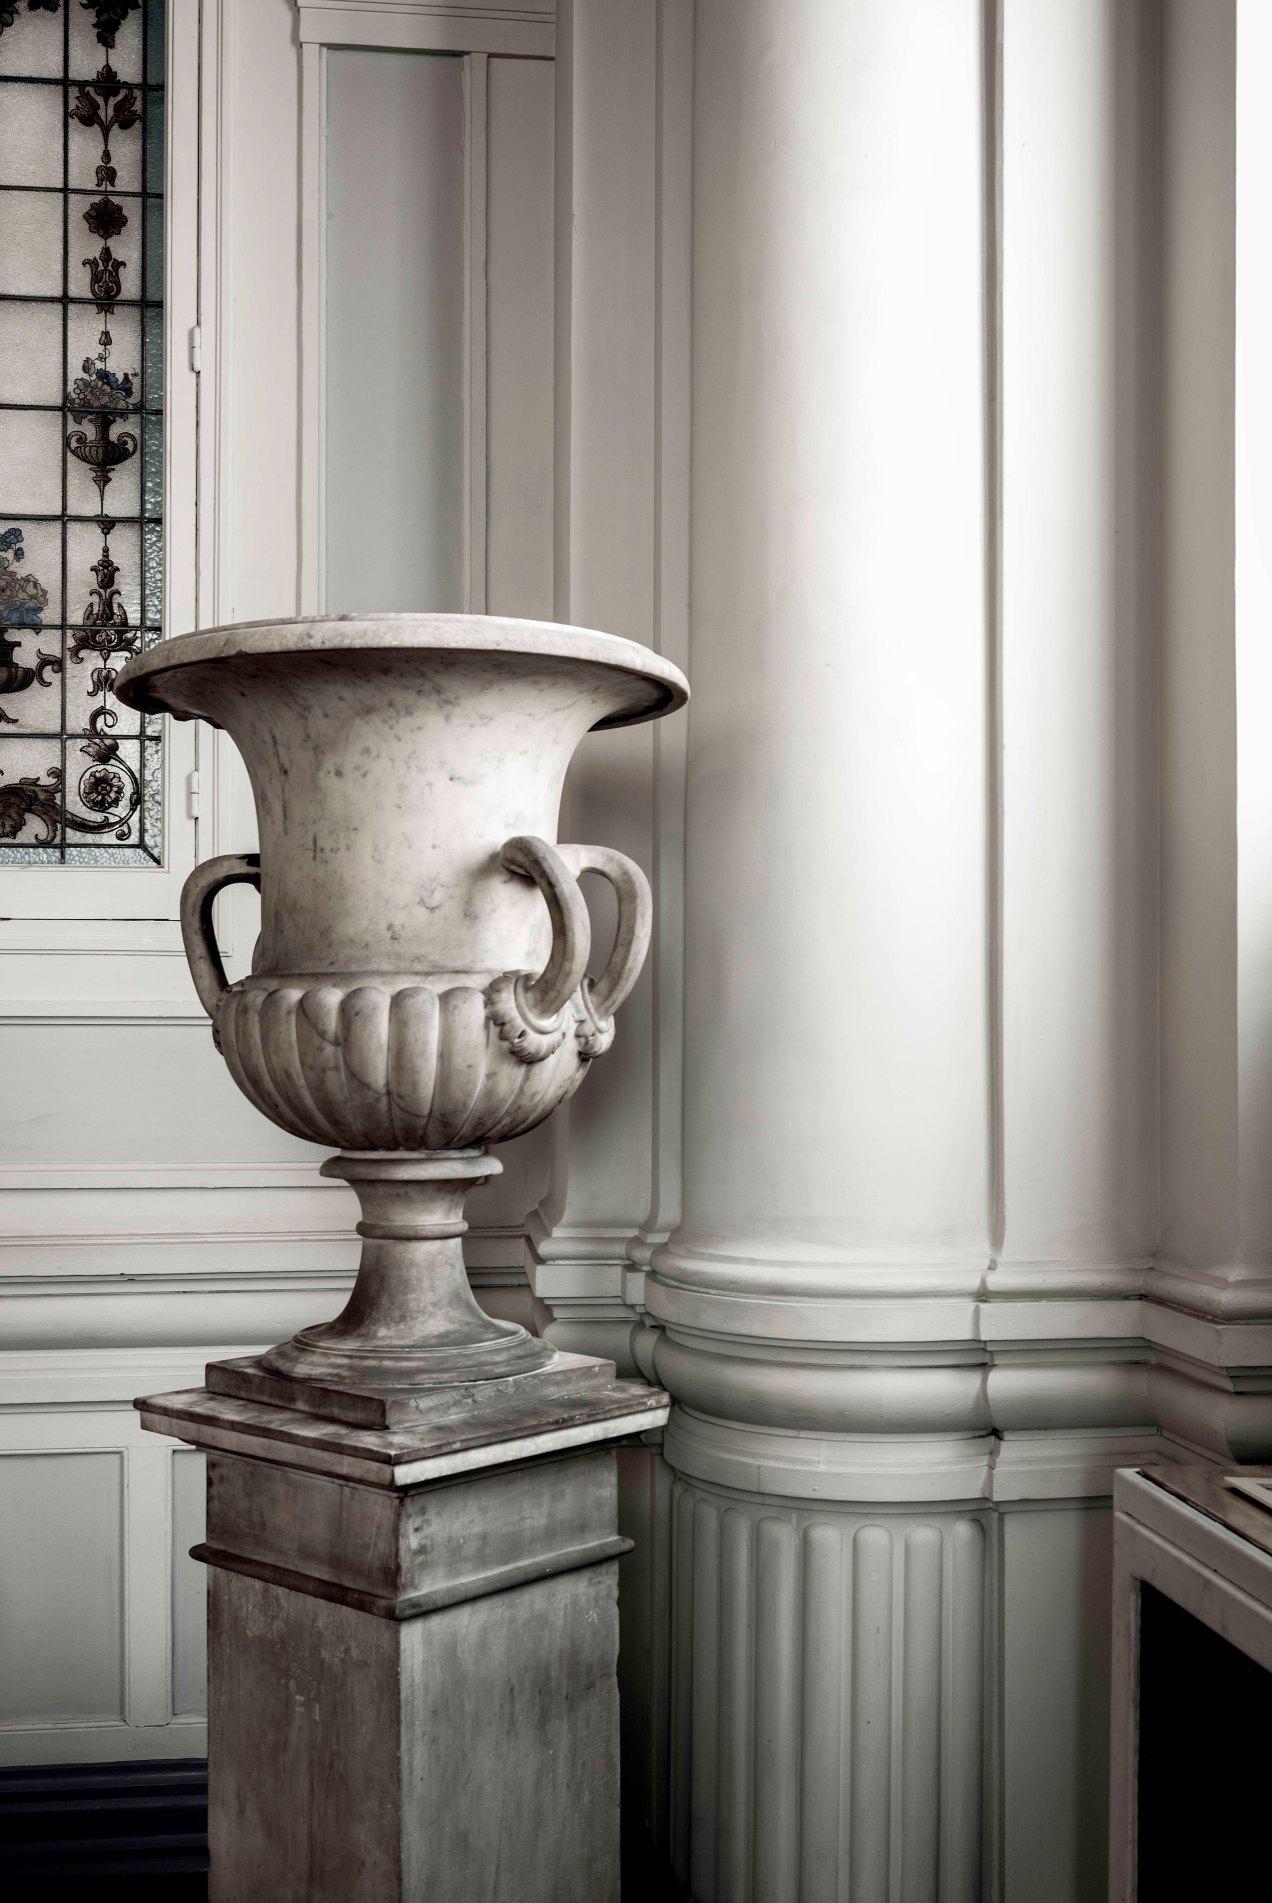 Vase Médicis, Hôtel Westminster, Nice, gildalliere, 2019